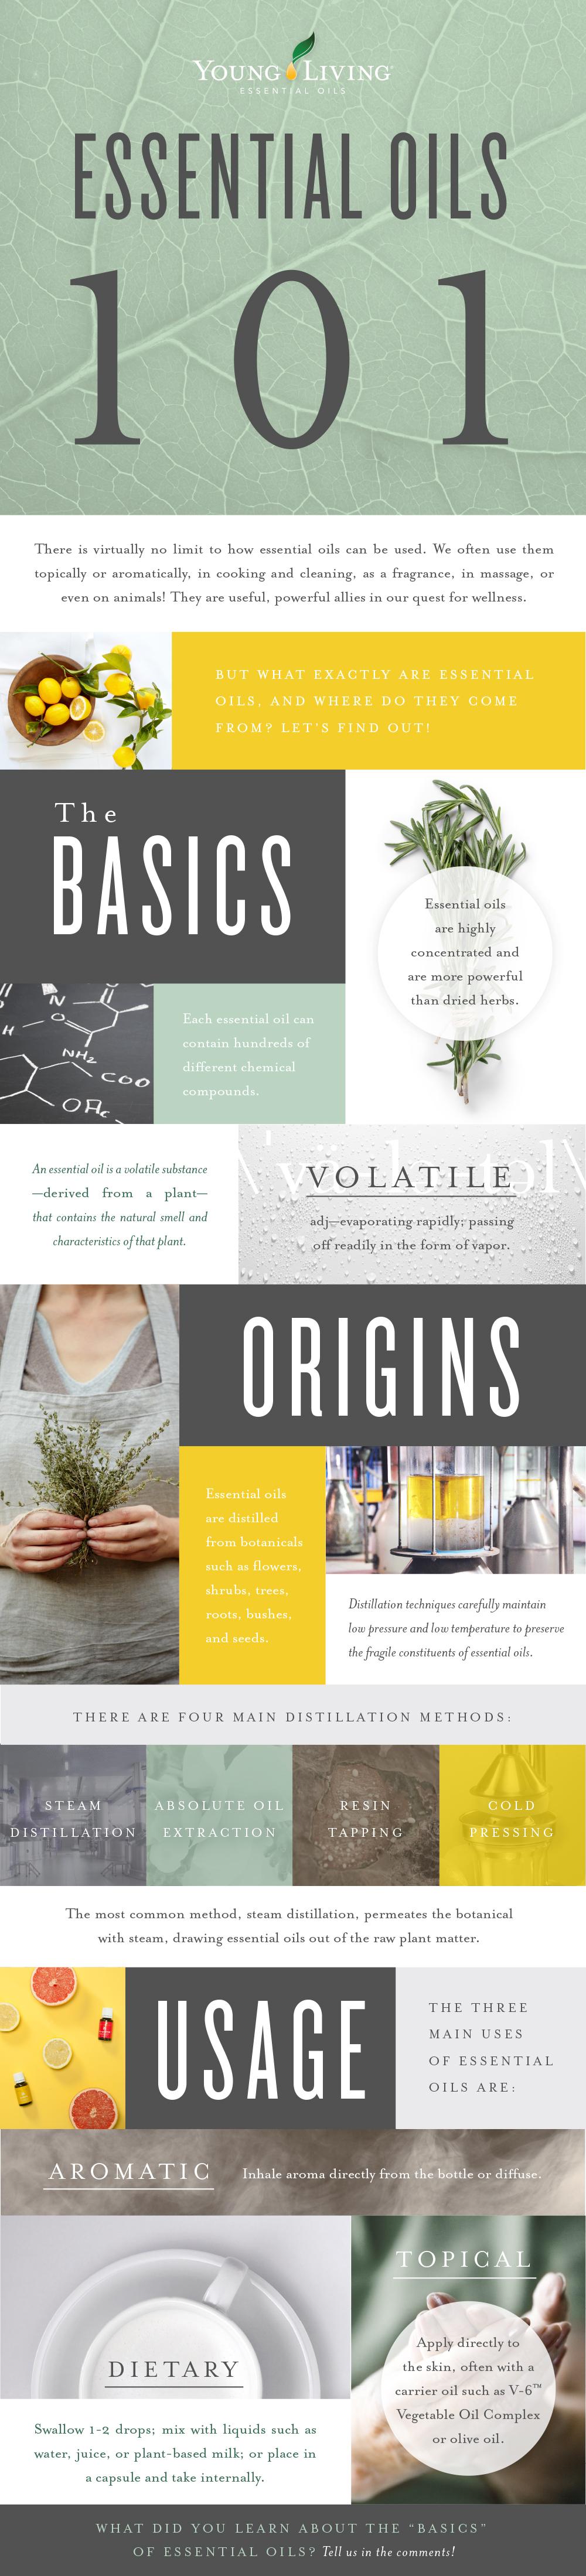 Usage Essential-oils.jpg